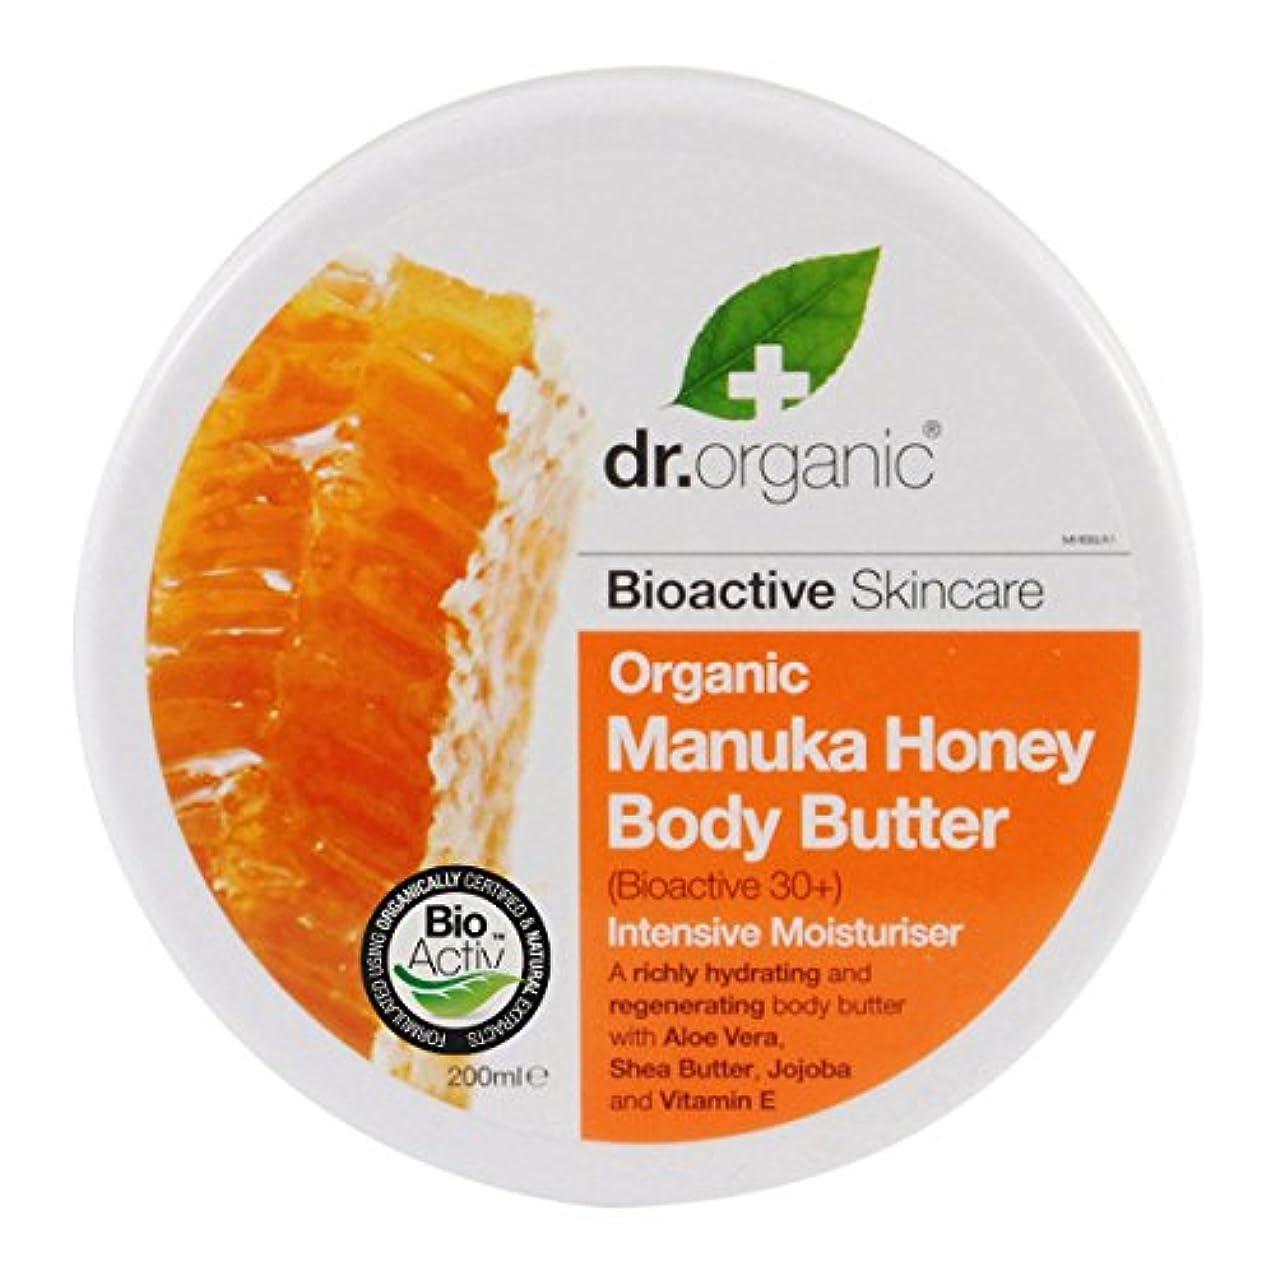 Dr.organic Organic Manuka Honey Body Butter 200ml [並行輸入品]